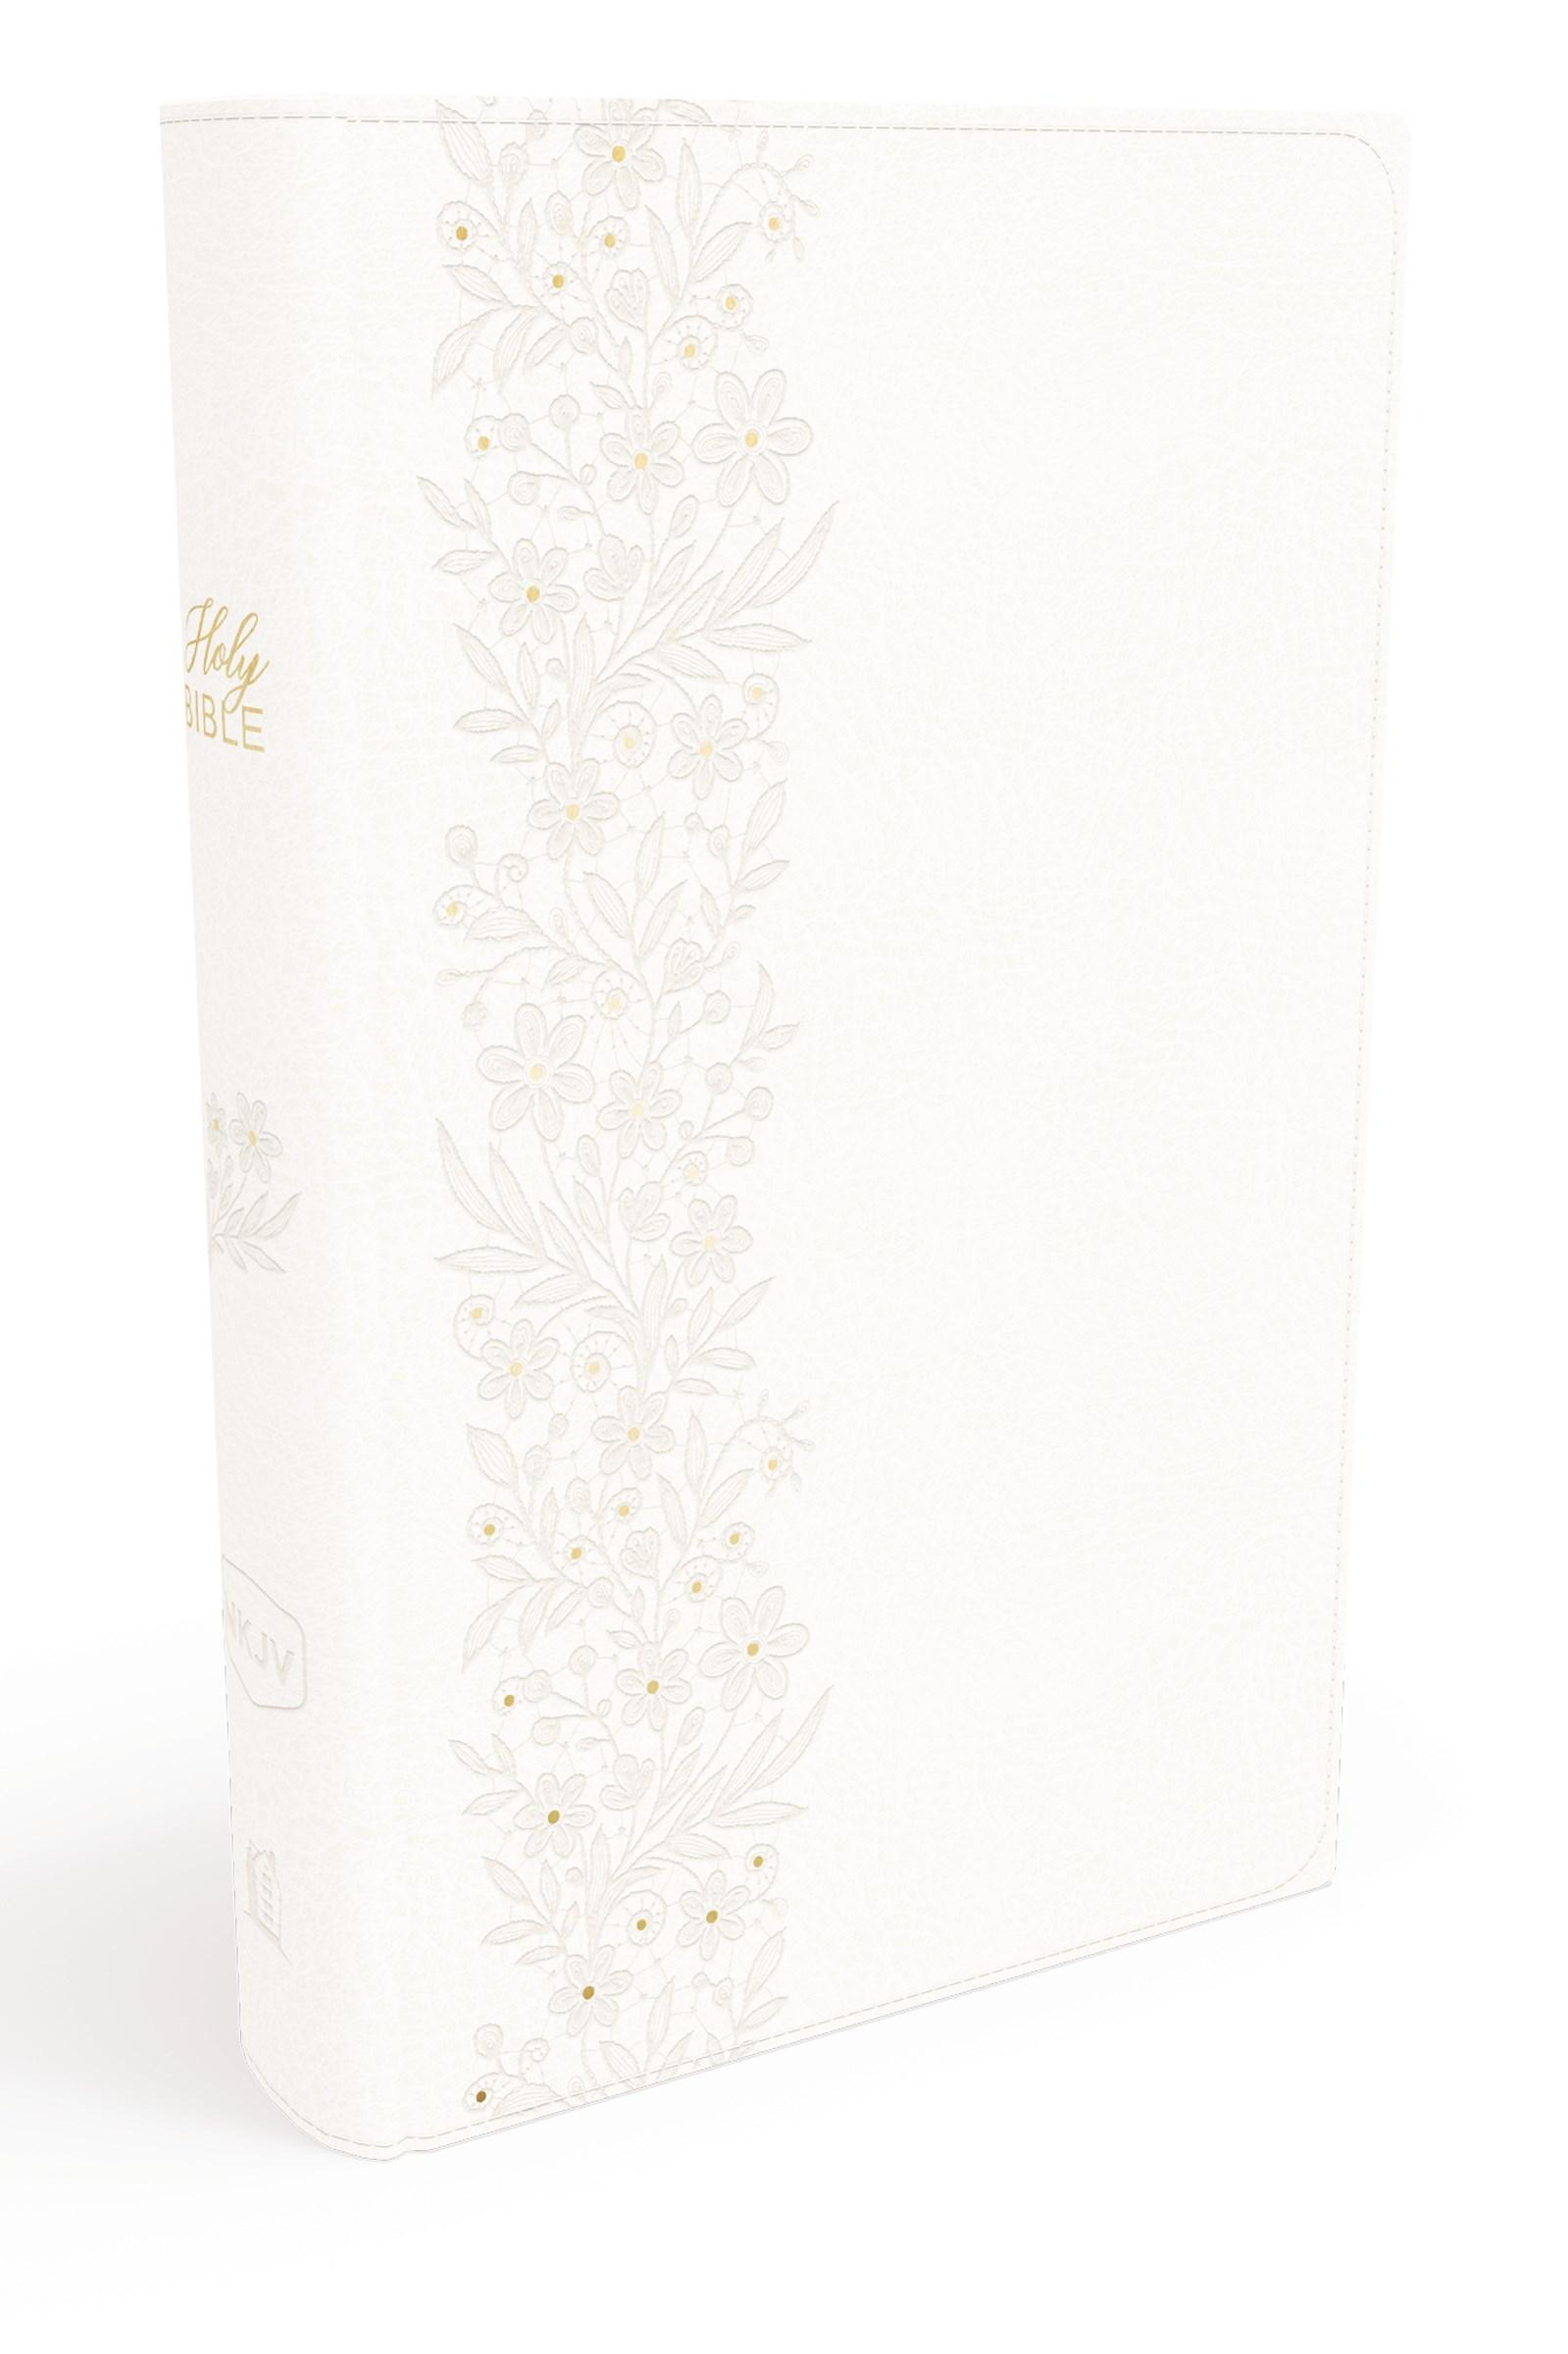 NKJV Bride's Bible (Comfort Print) White Leathersoft